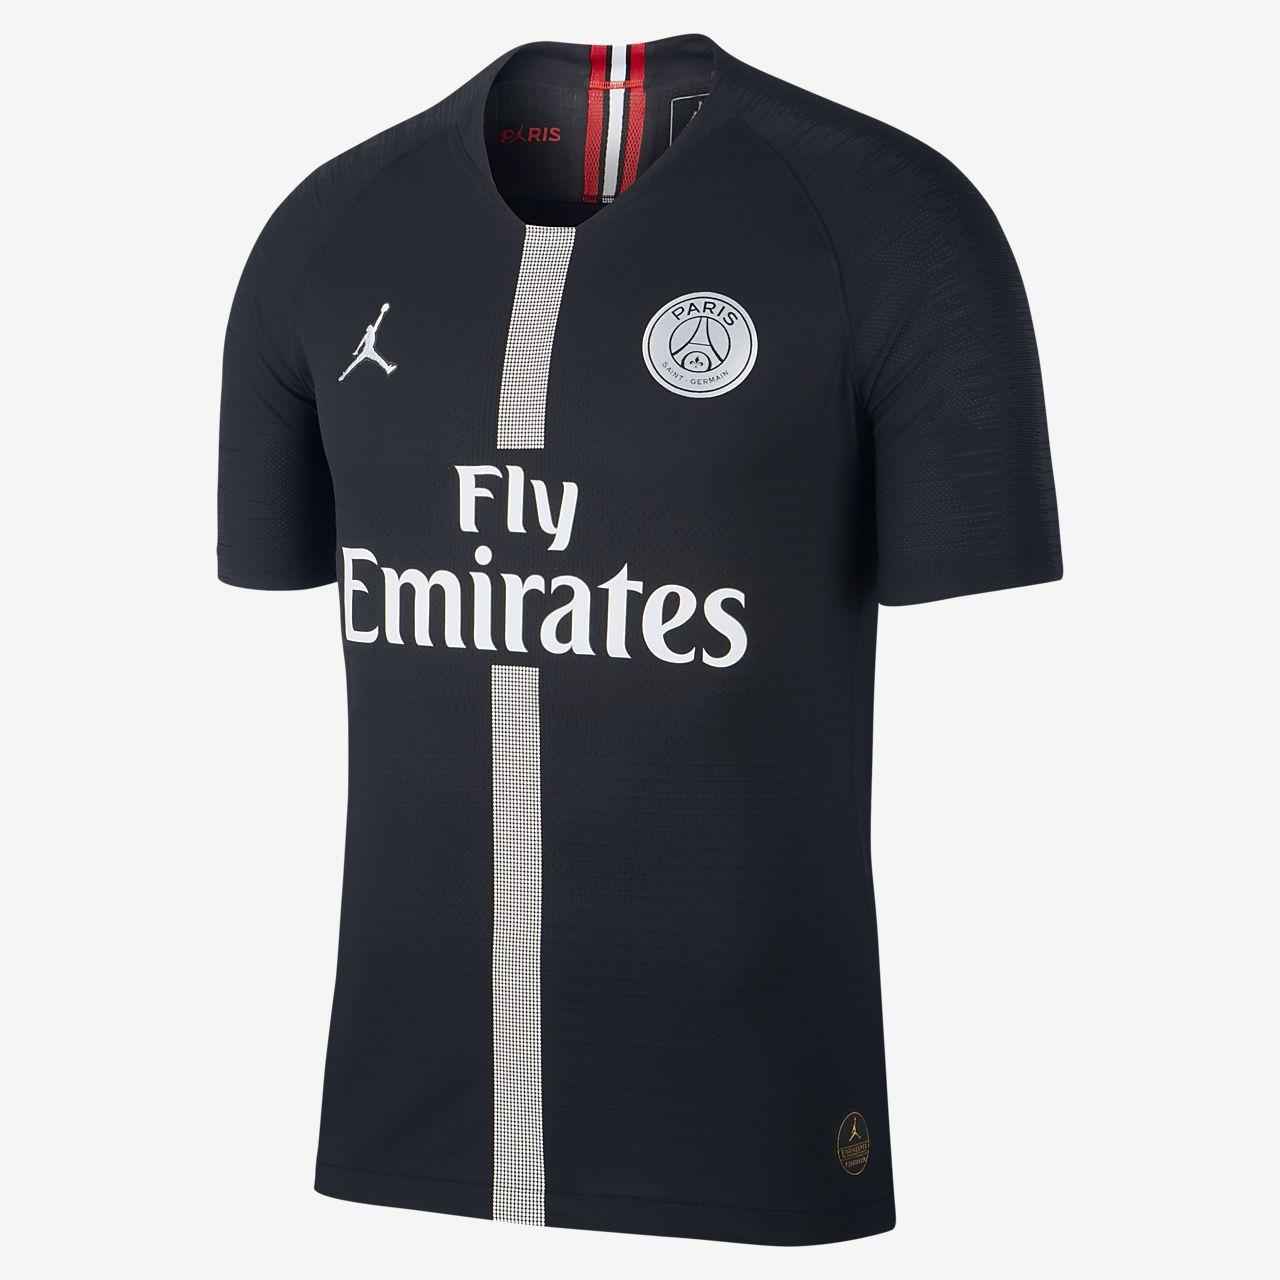 2018/19 Paris Saint-Germain Vapor Match Third Erkek Futbol Forması